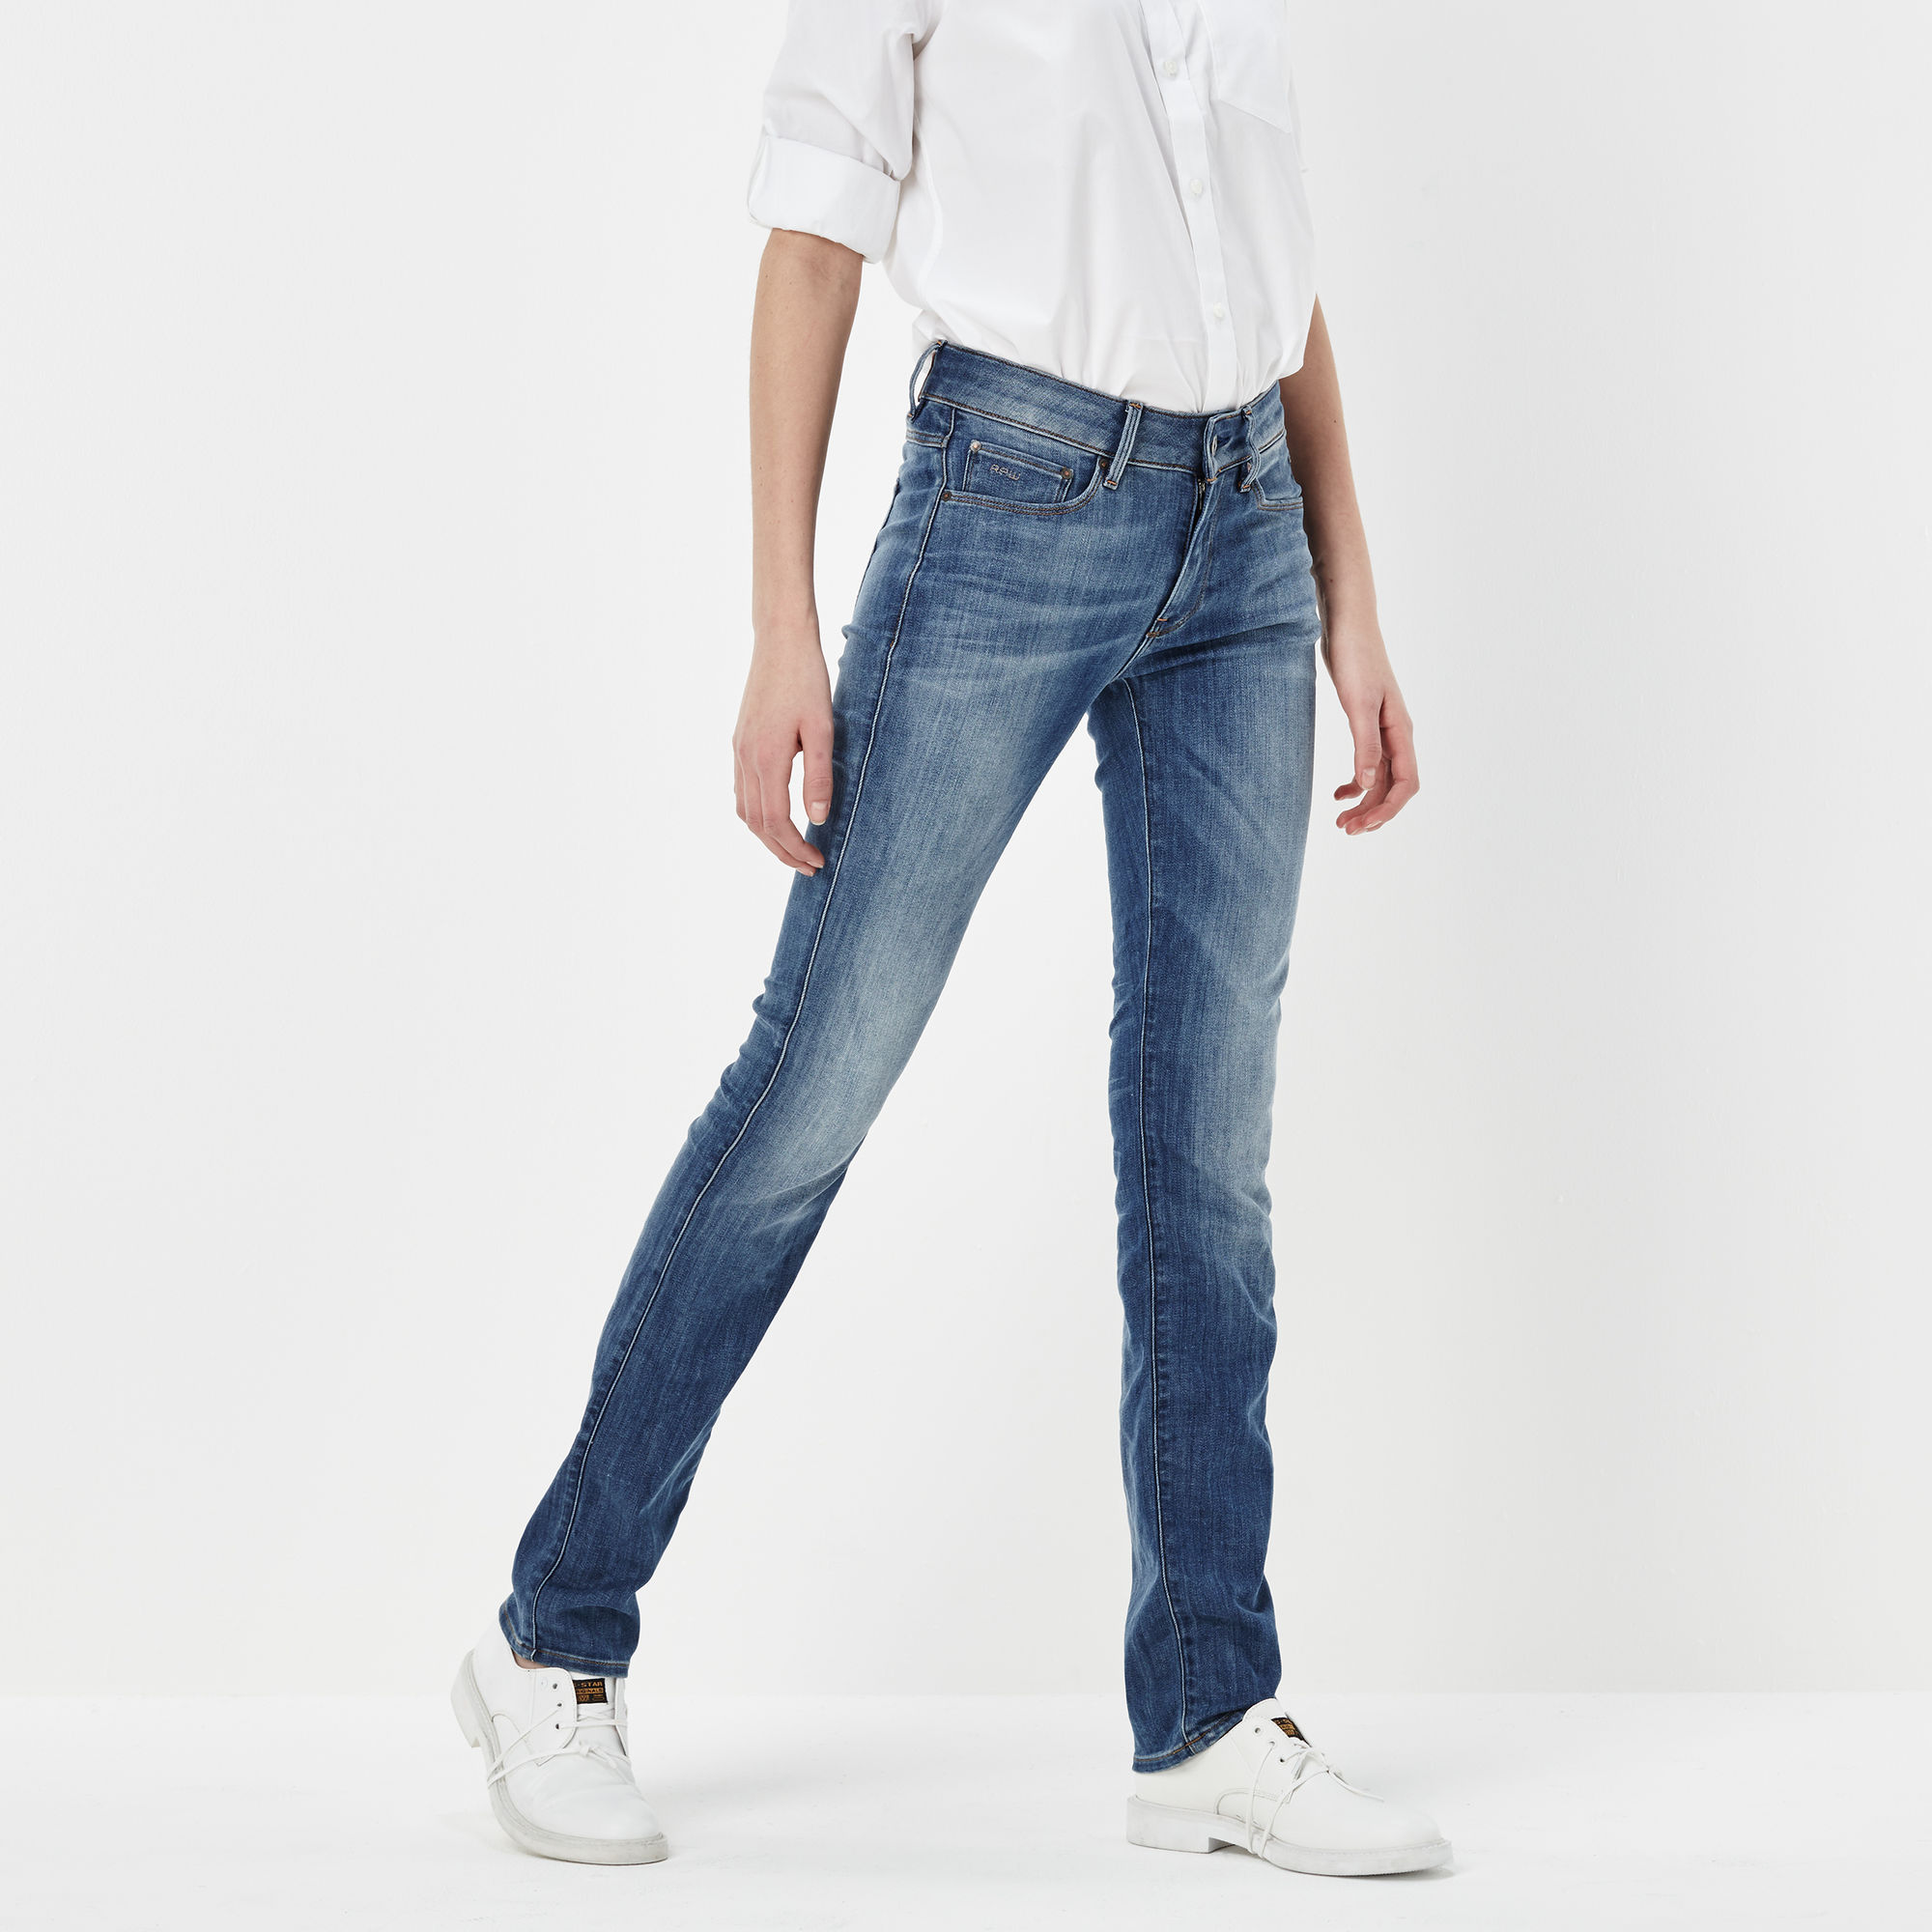 Van G Star Raw 3301 Contour High Waist Straight Jeans Prijsvergelijk nu!